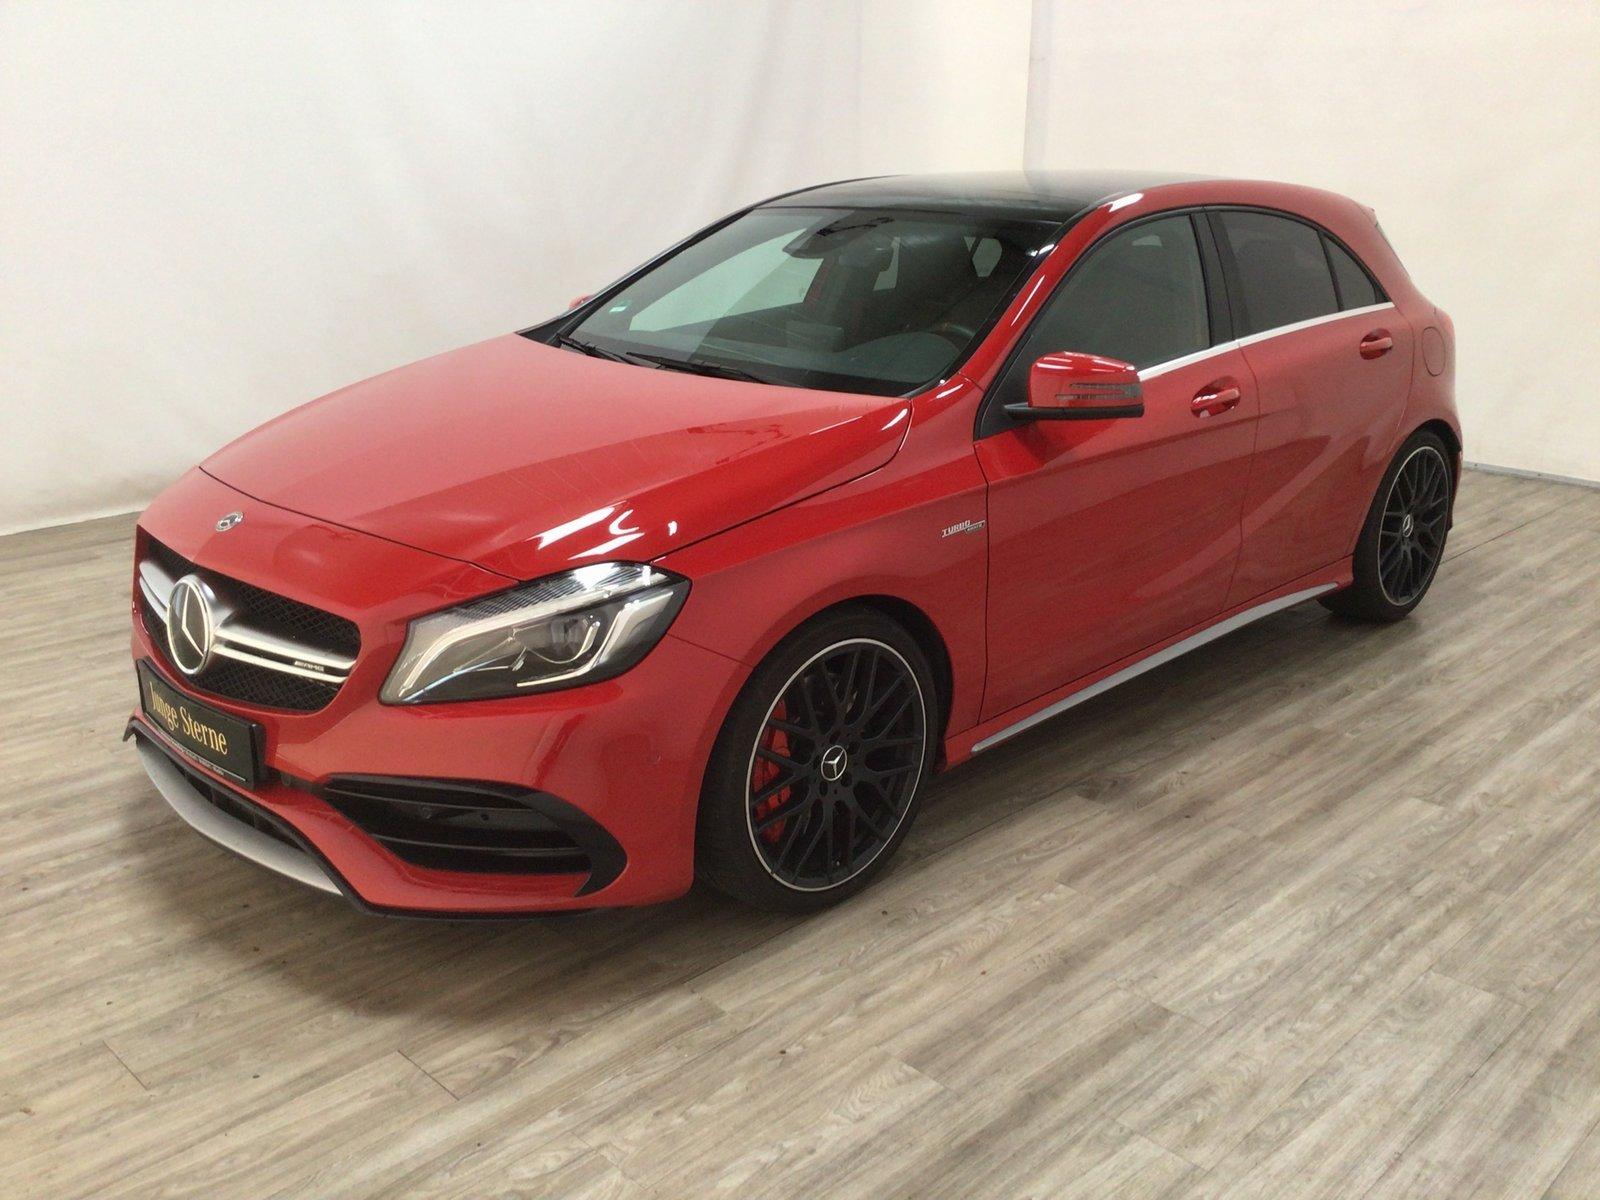 Mercedes-Benz A 45 AMG 4M COMAND*Pano*LED*Kamera*Distro*Memory, Jahr 2017, Benzin